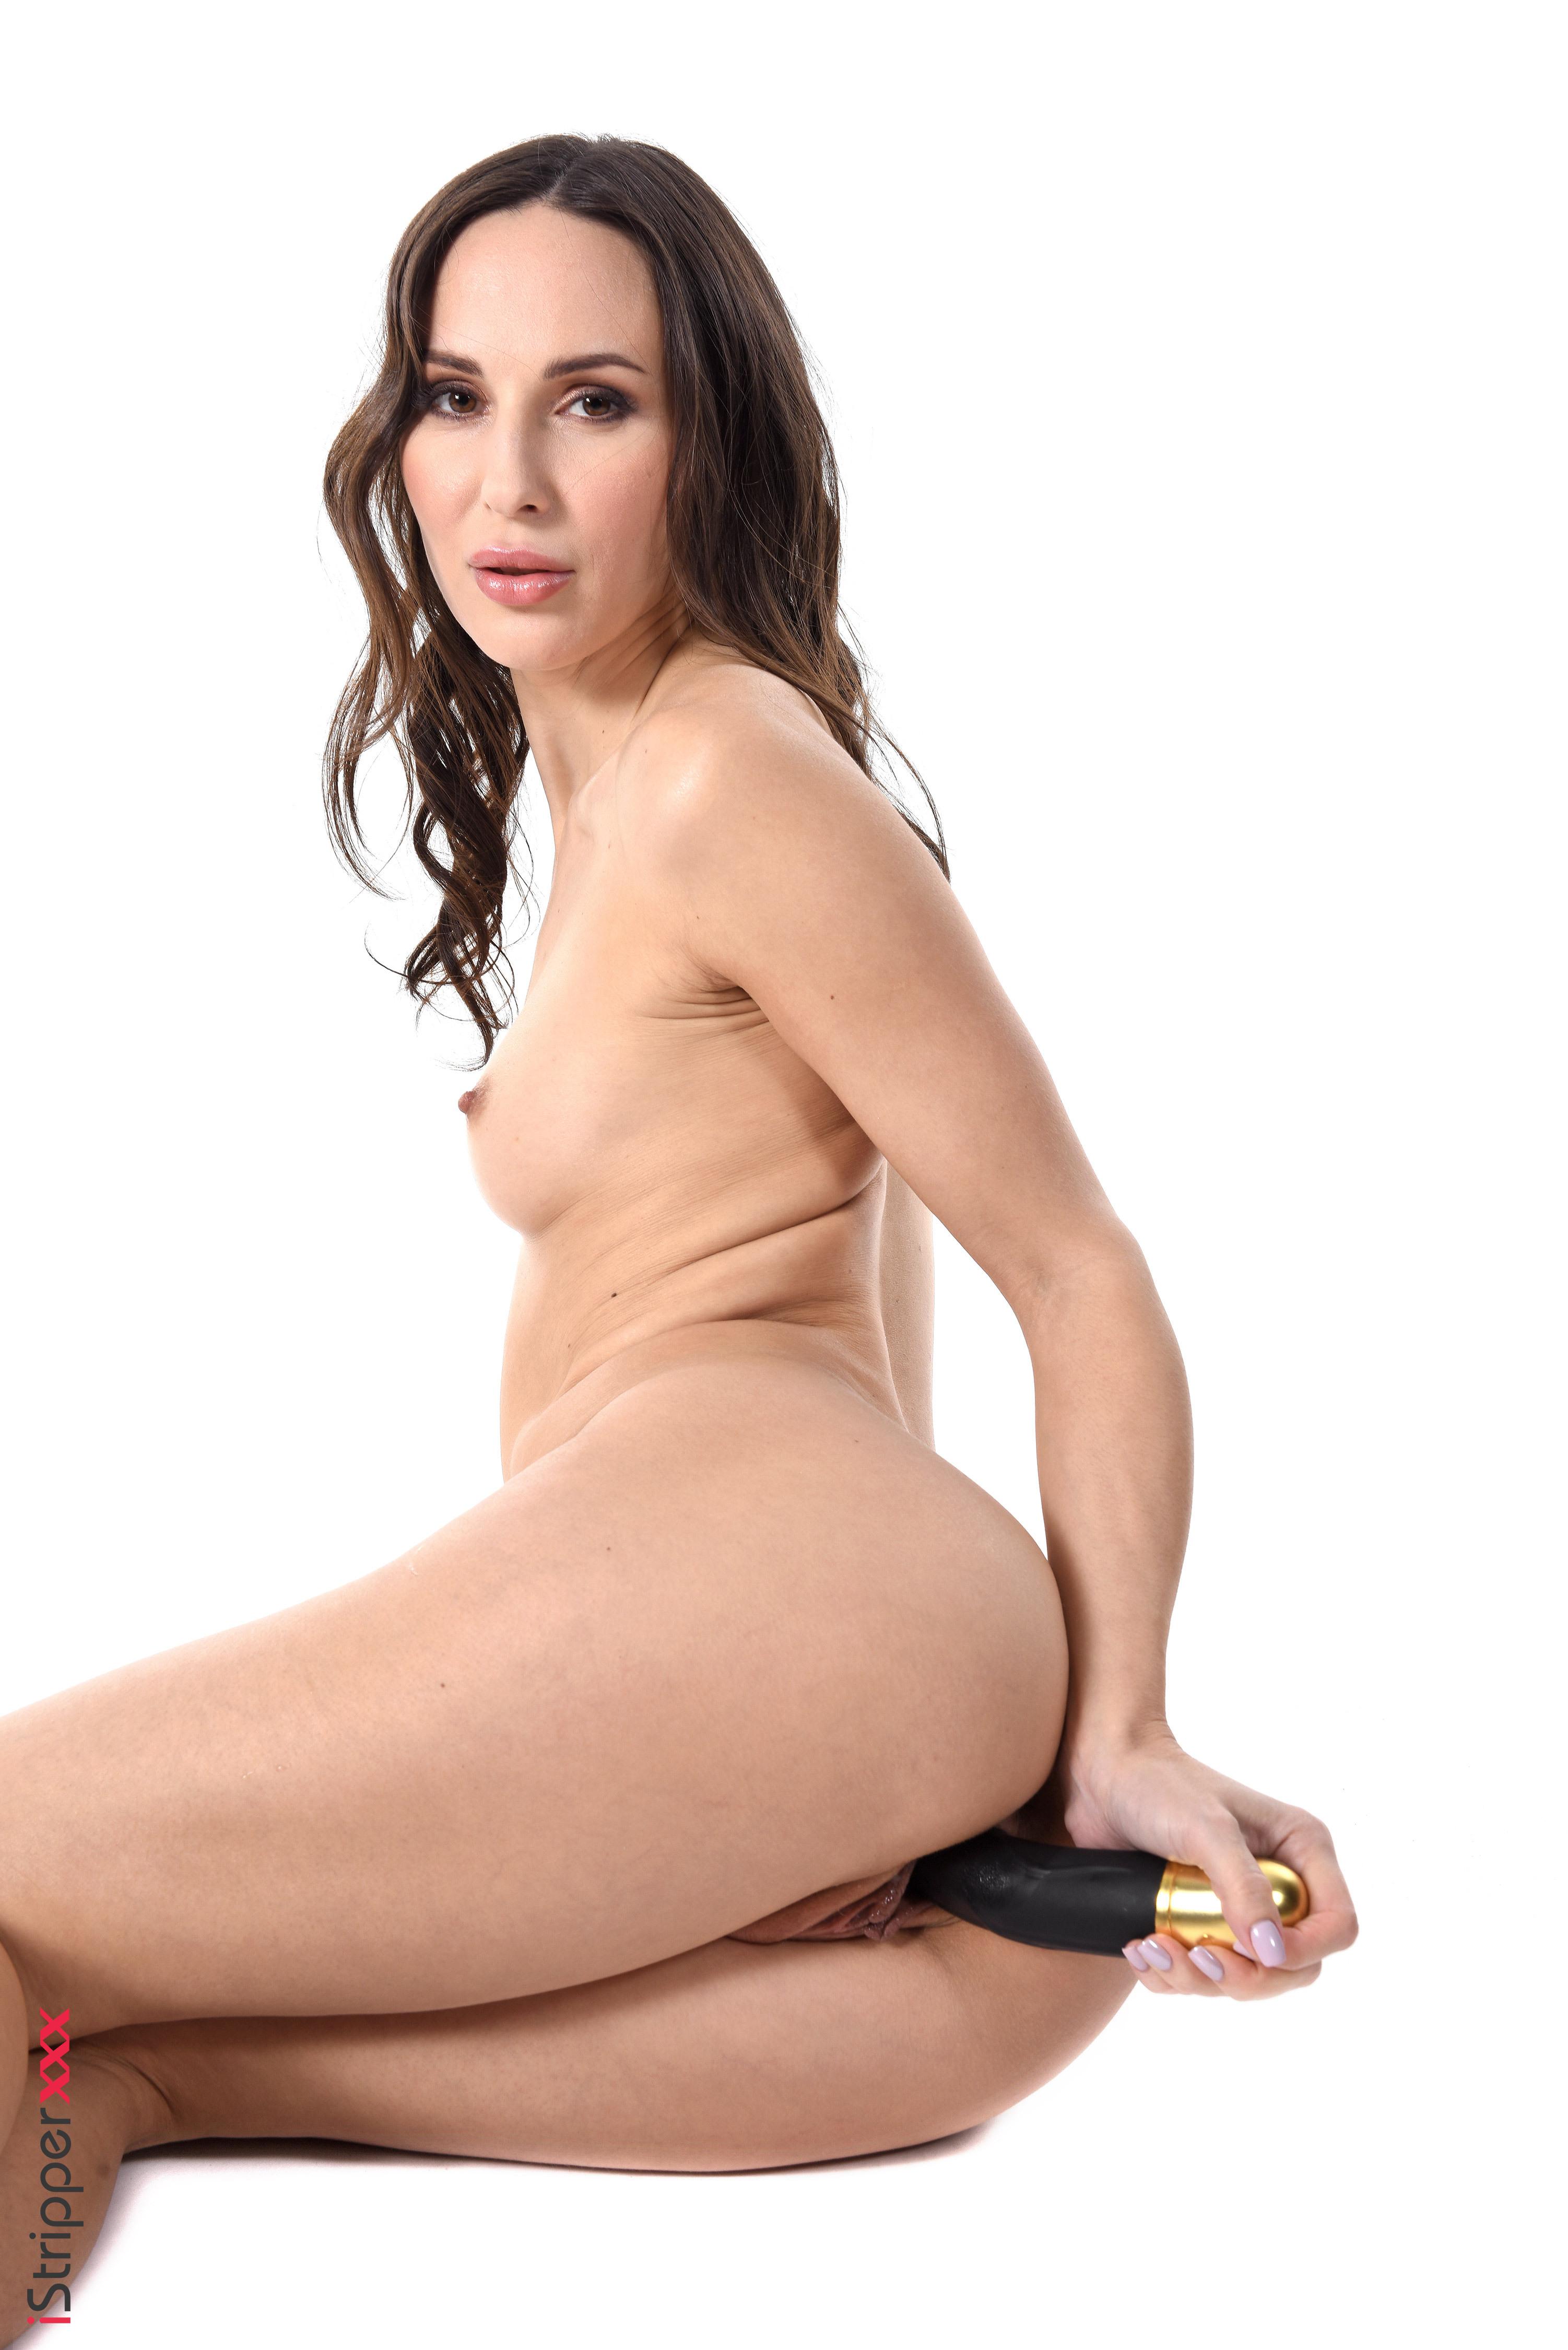 girls Nude wallpaper